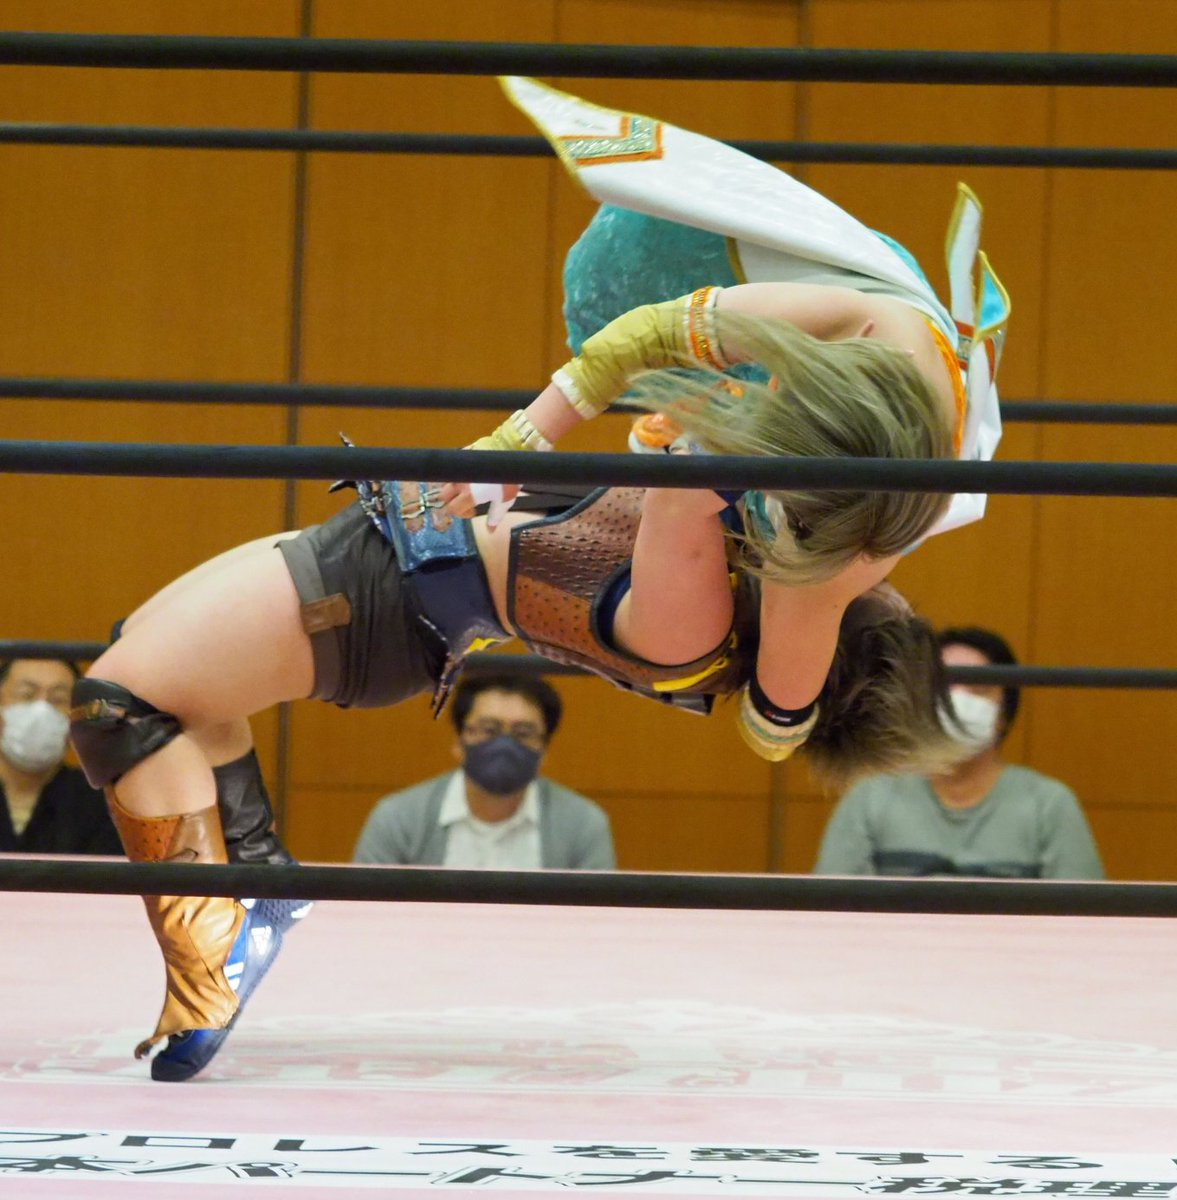 Nodoka Yuka